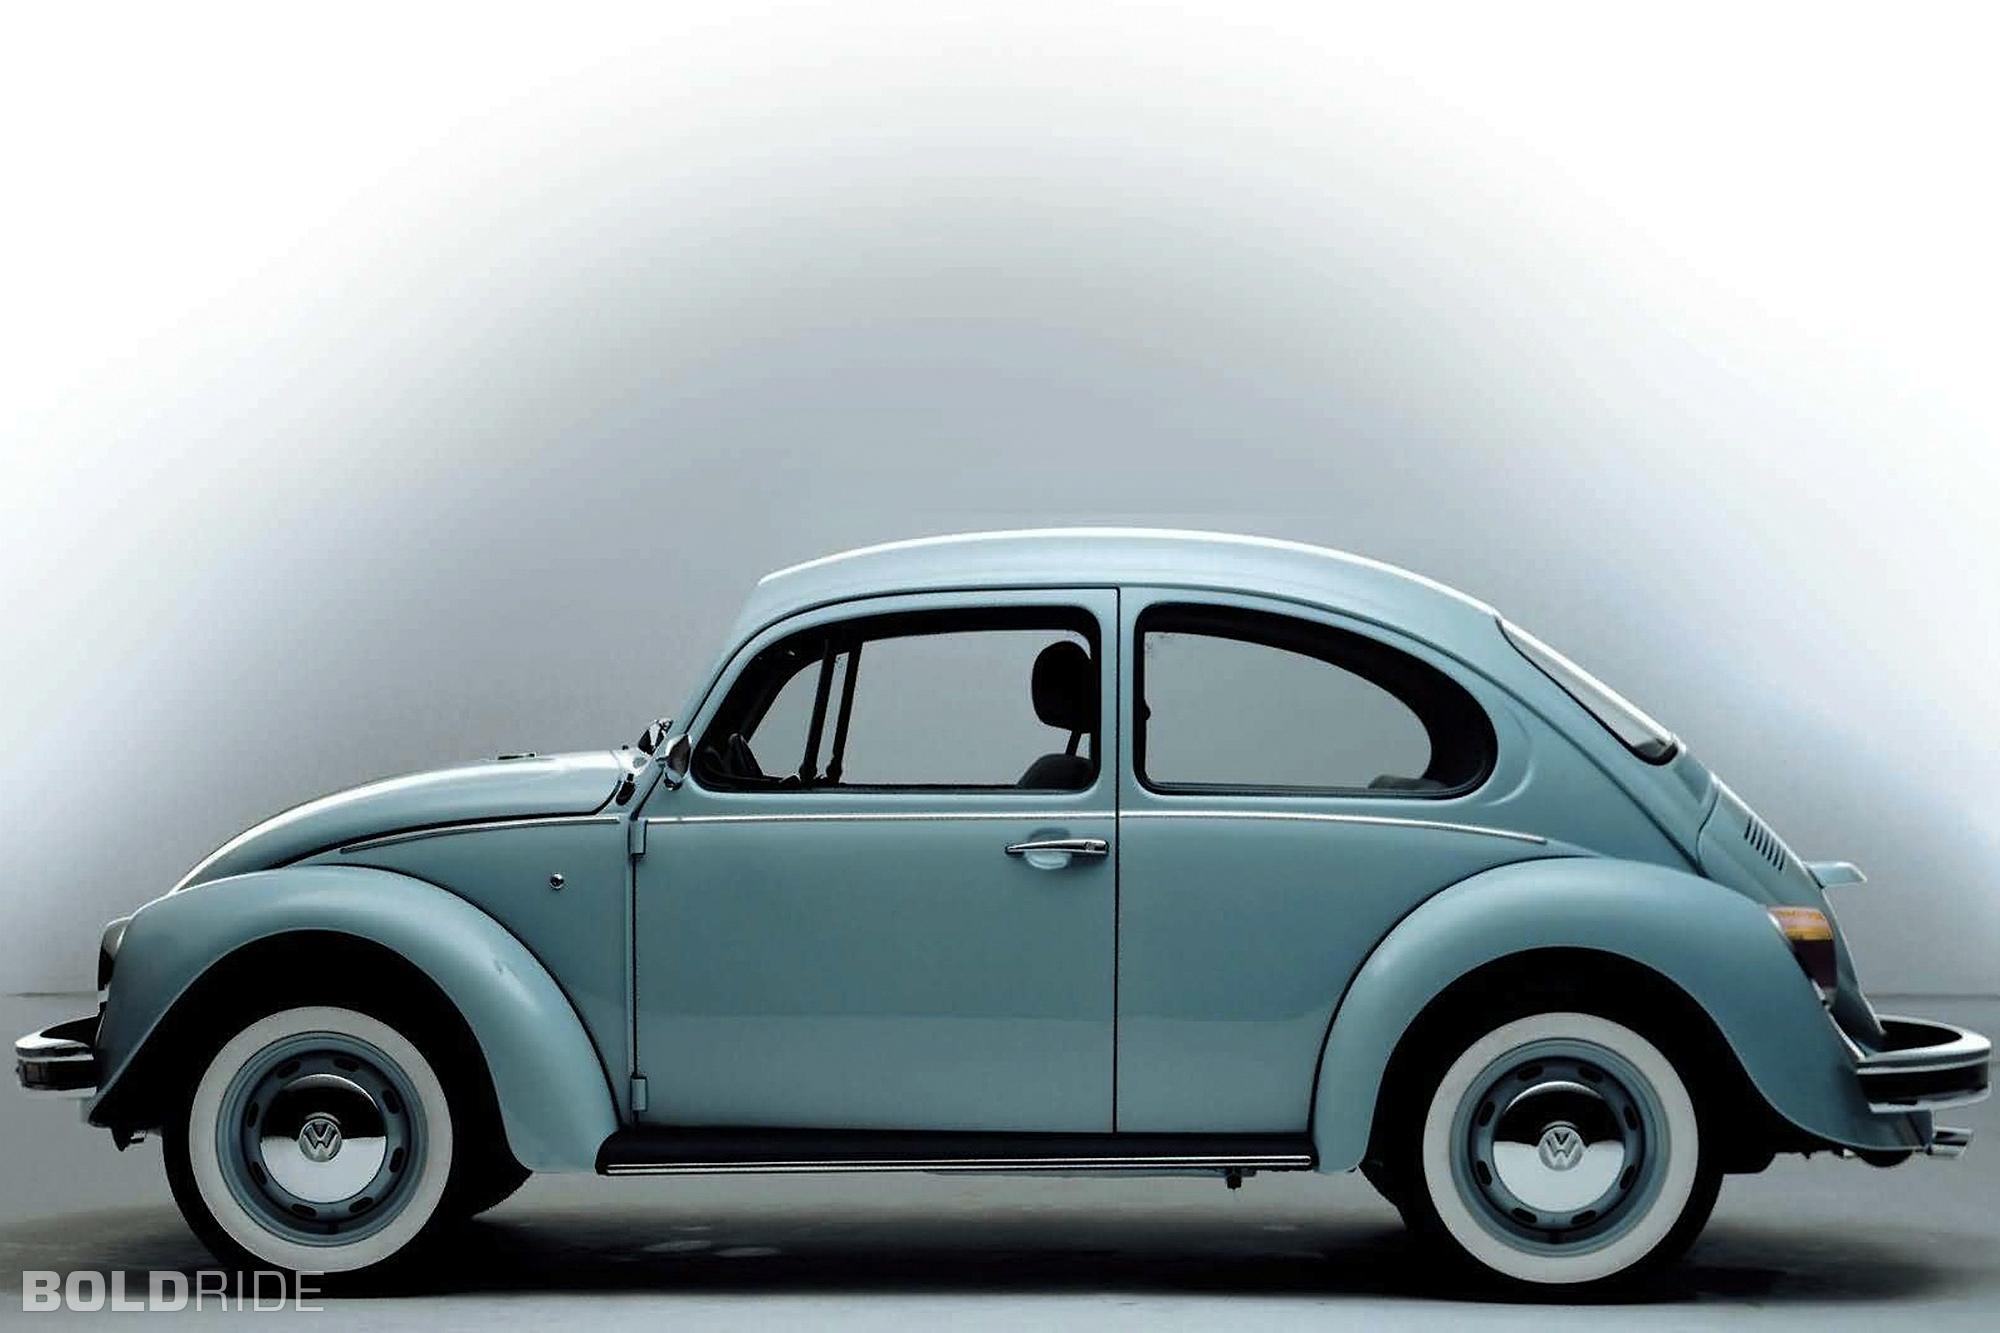 2003 volkswagen beetle partsopen. Black Bedroom Furniture Sets. Home Design Ideas